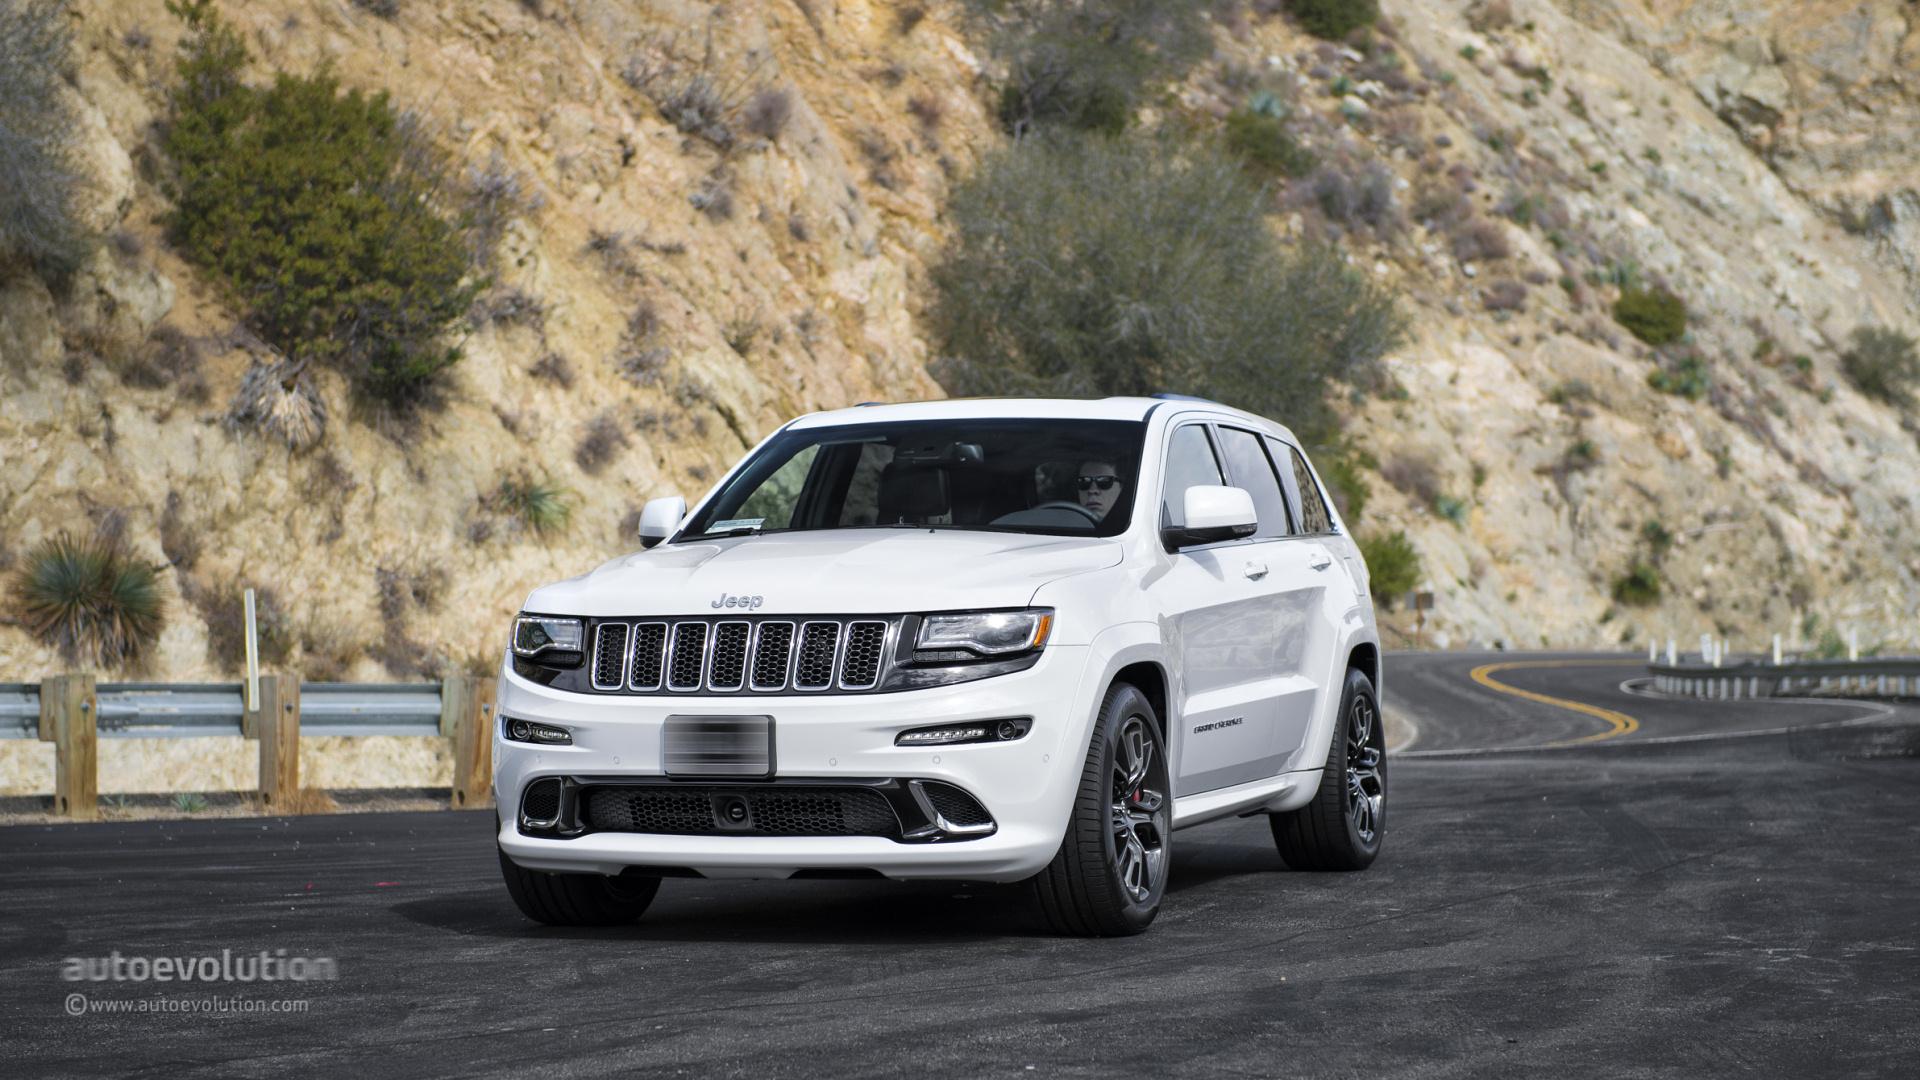 2014 Jeep Grand Cherokee Srt Hd Wallpapers Autoevolution